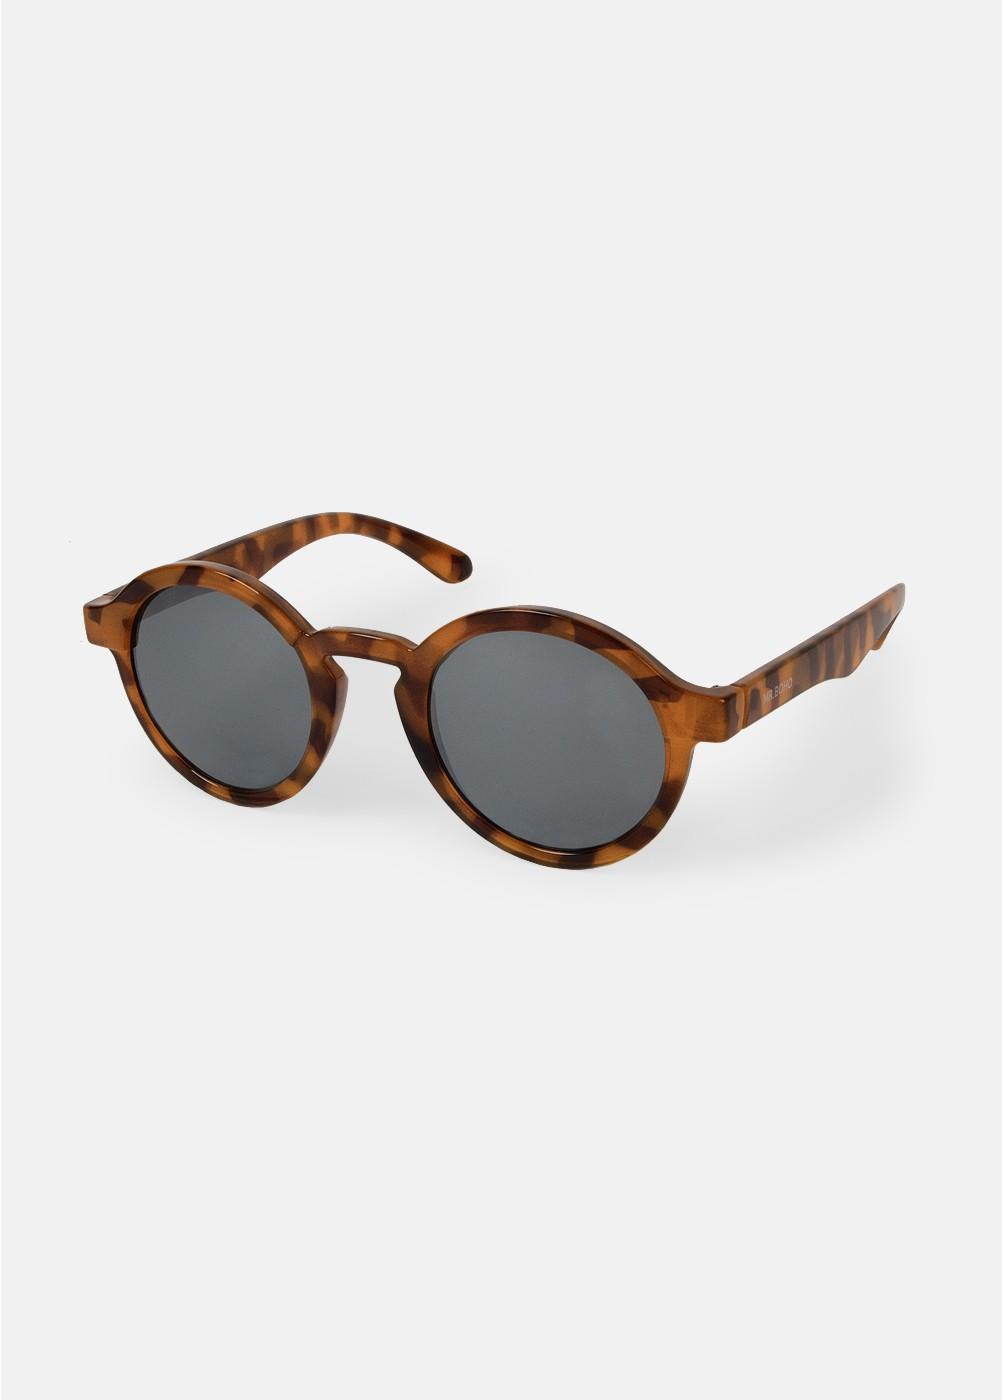 Gafas Dalton by MR. BOHO